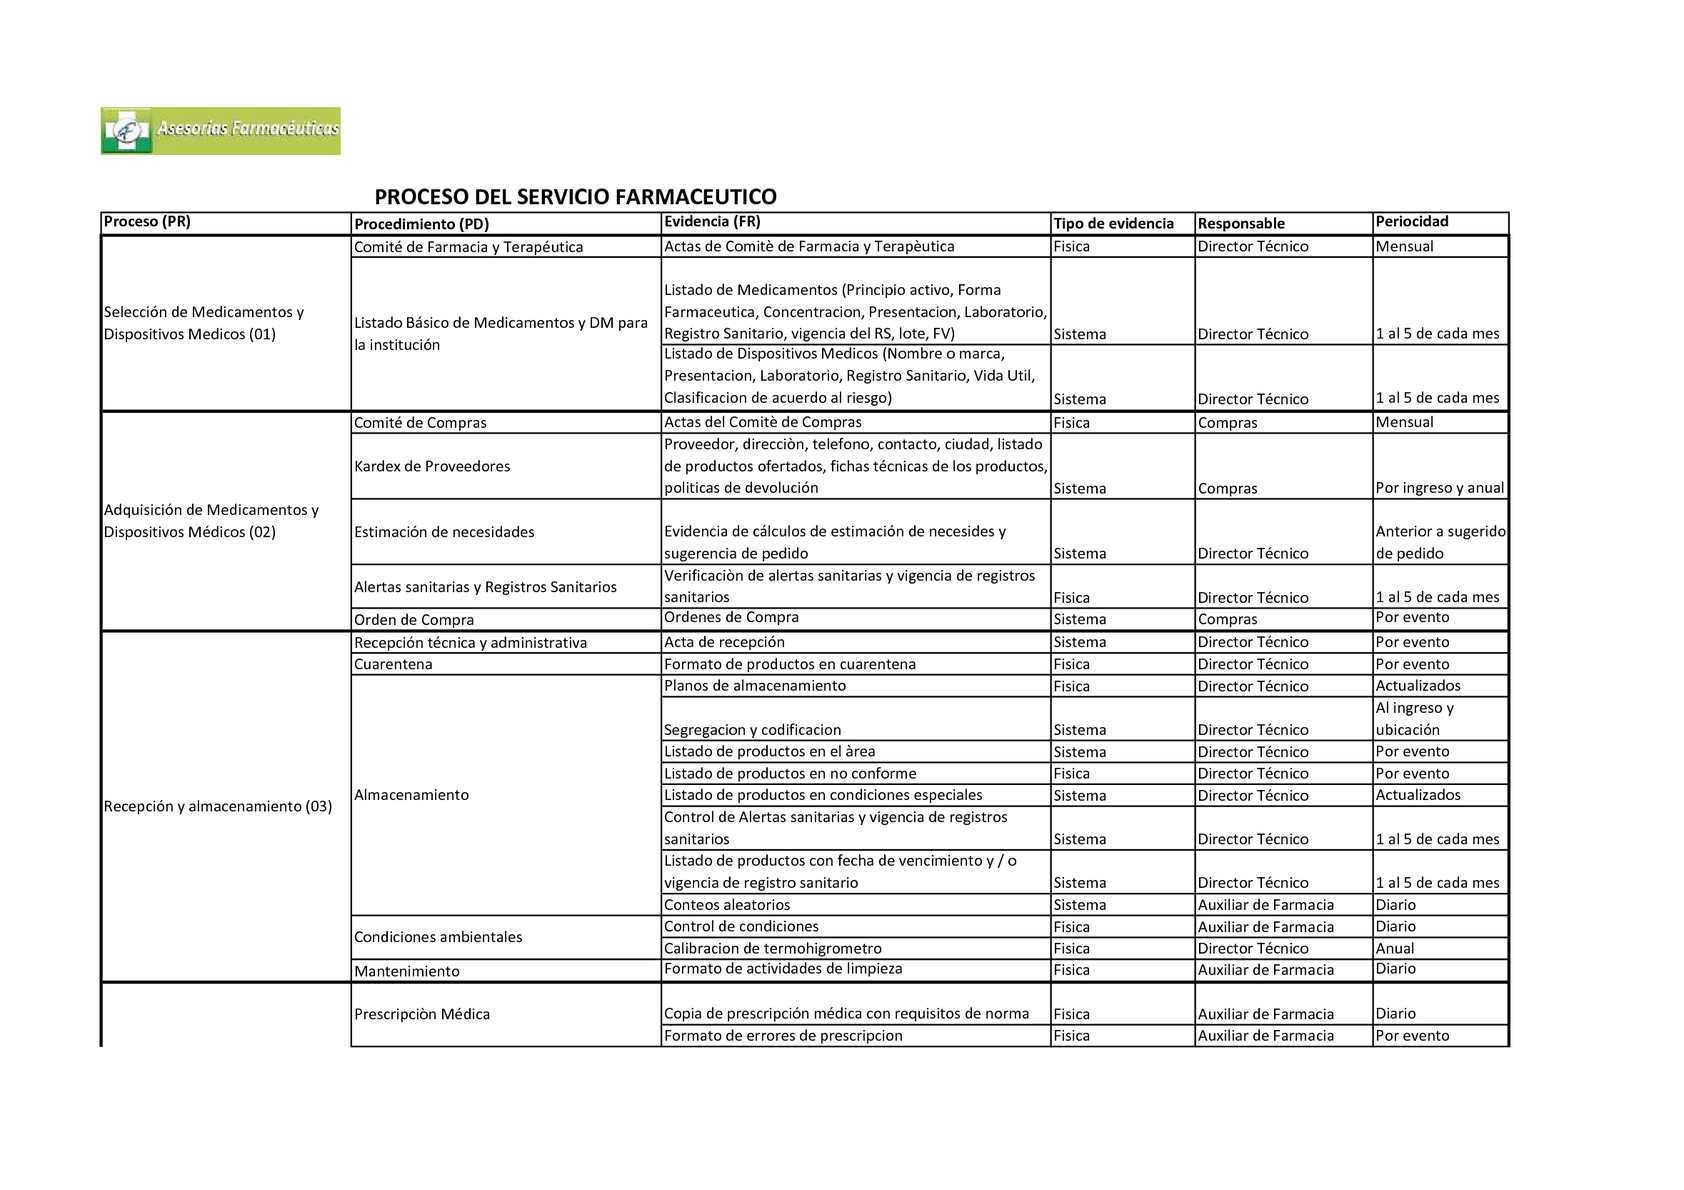 Calaméo - Mapa de Procesos en un servicio Farmacéutico